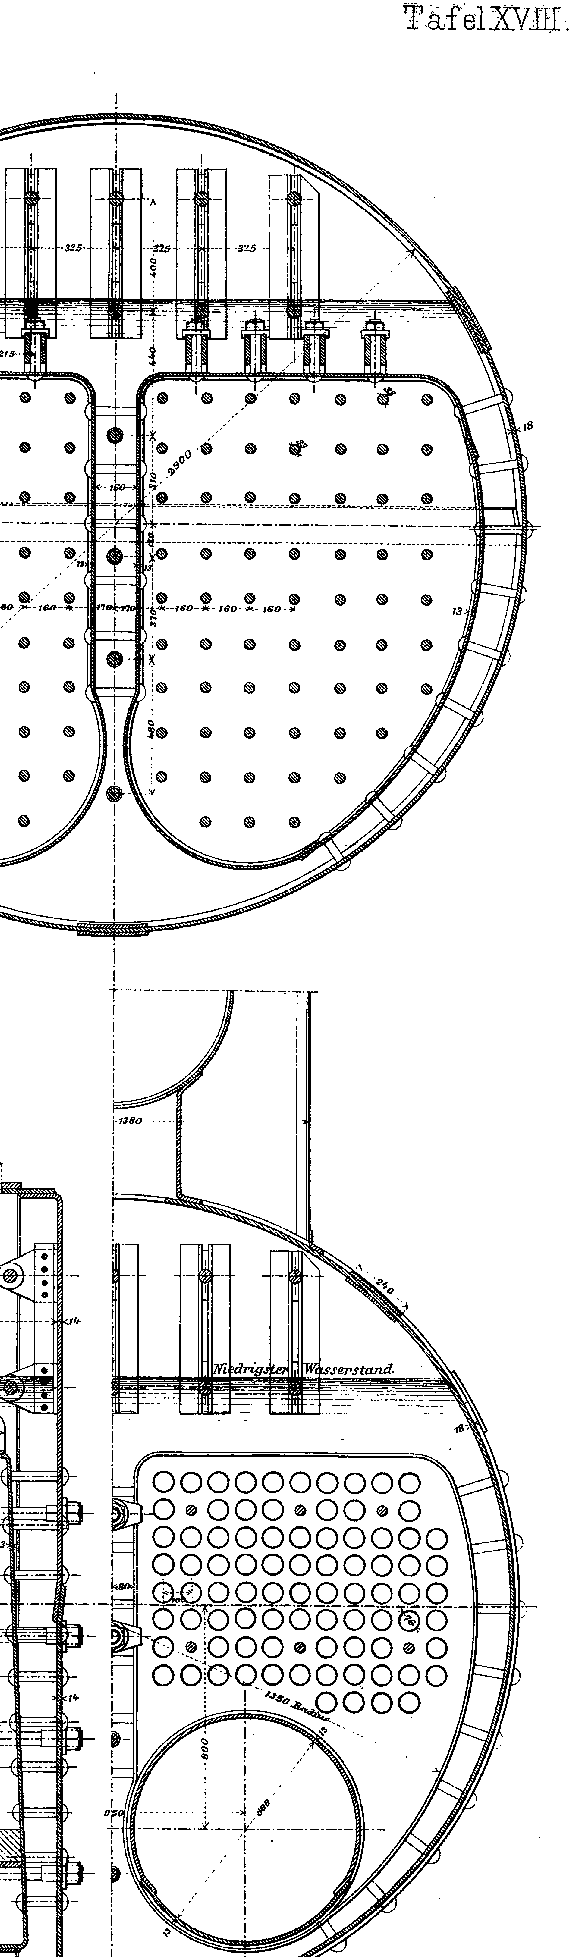 [merged small][ocr errors][ocr errors][ocr errors][ocr errors][ocr errors][merged small][ocr errors][merged small][ocr errors][ocr errors][merged small][ocr errors][merged small][ocr errors][merged small][merged small][merged small][ocr errors][ocr errors][merged small]